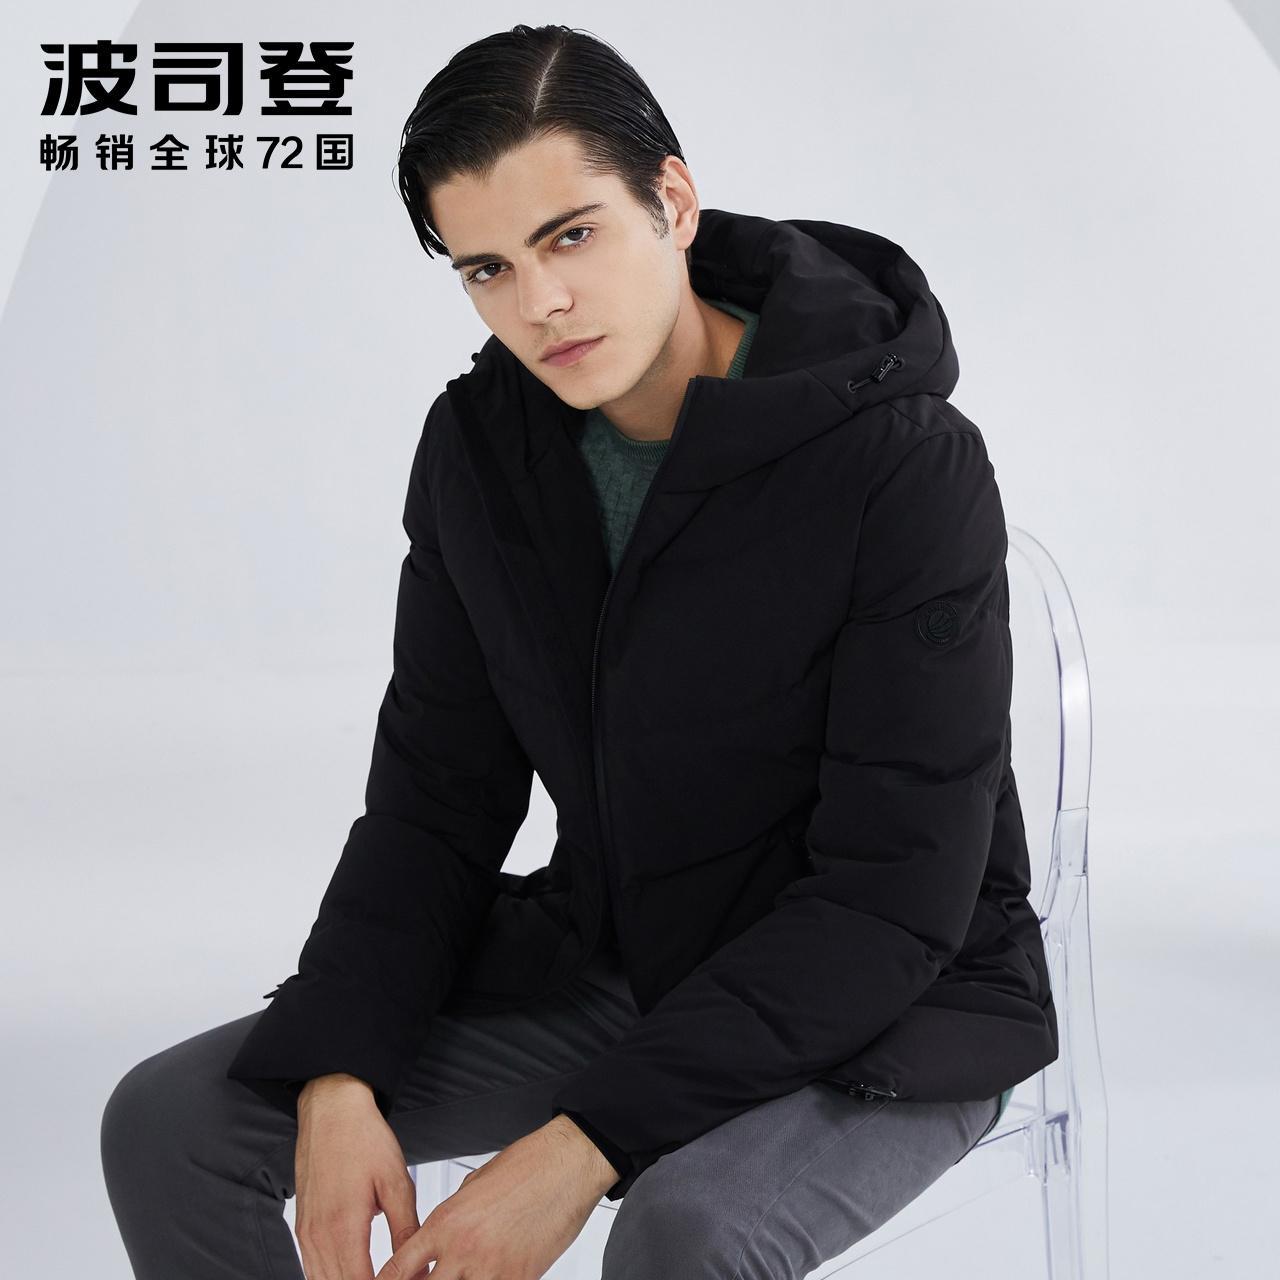 B80141025 波司登青年短款羽绒服男士连帽防寒外套冬季款